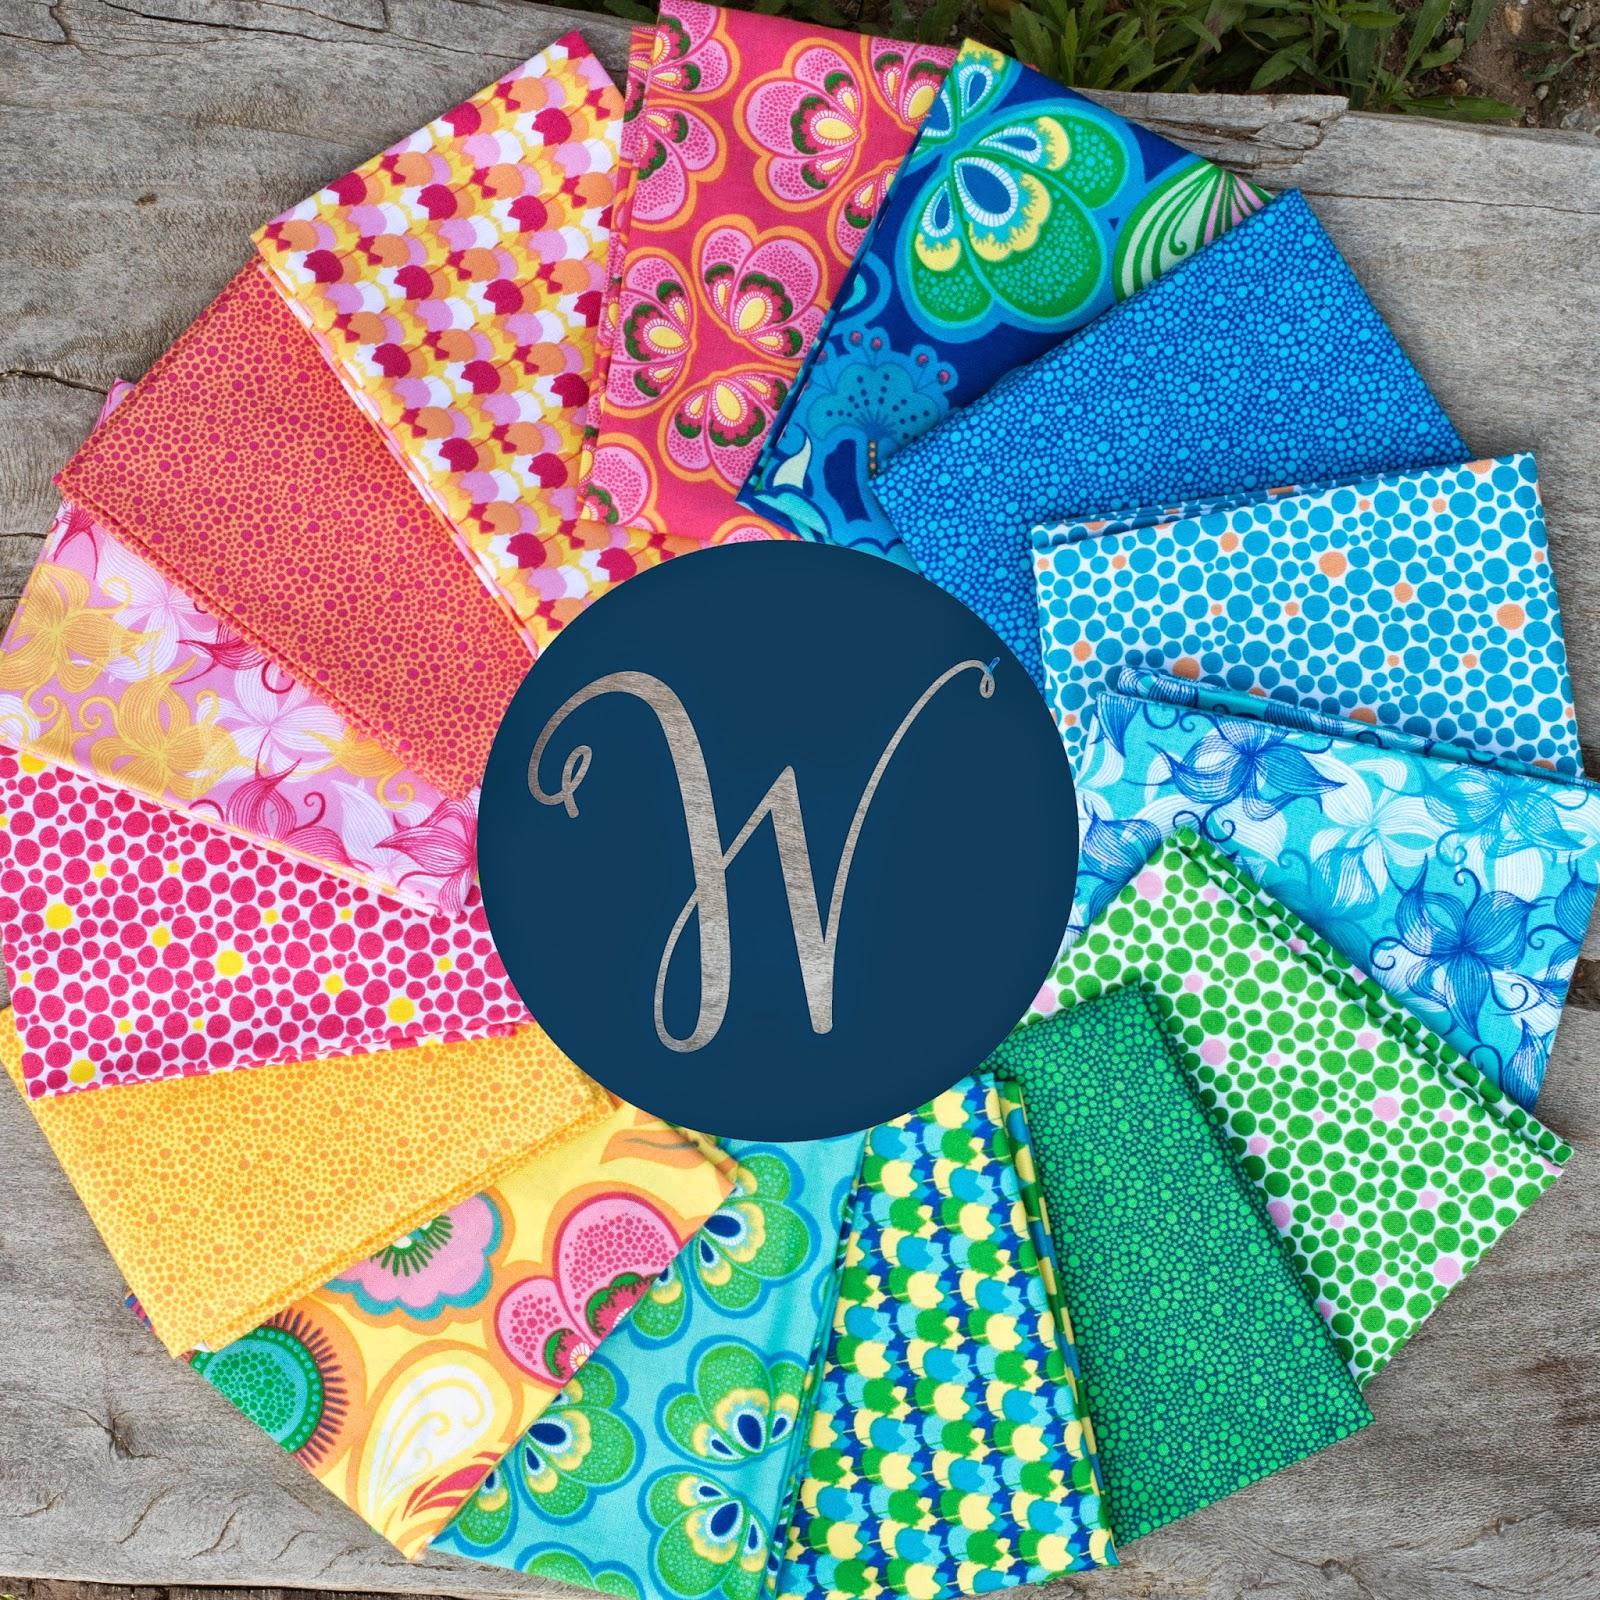 Bella Caronia, Spring Bloom Fabric, Windham Fabrics